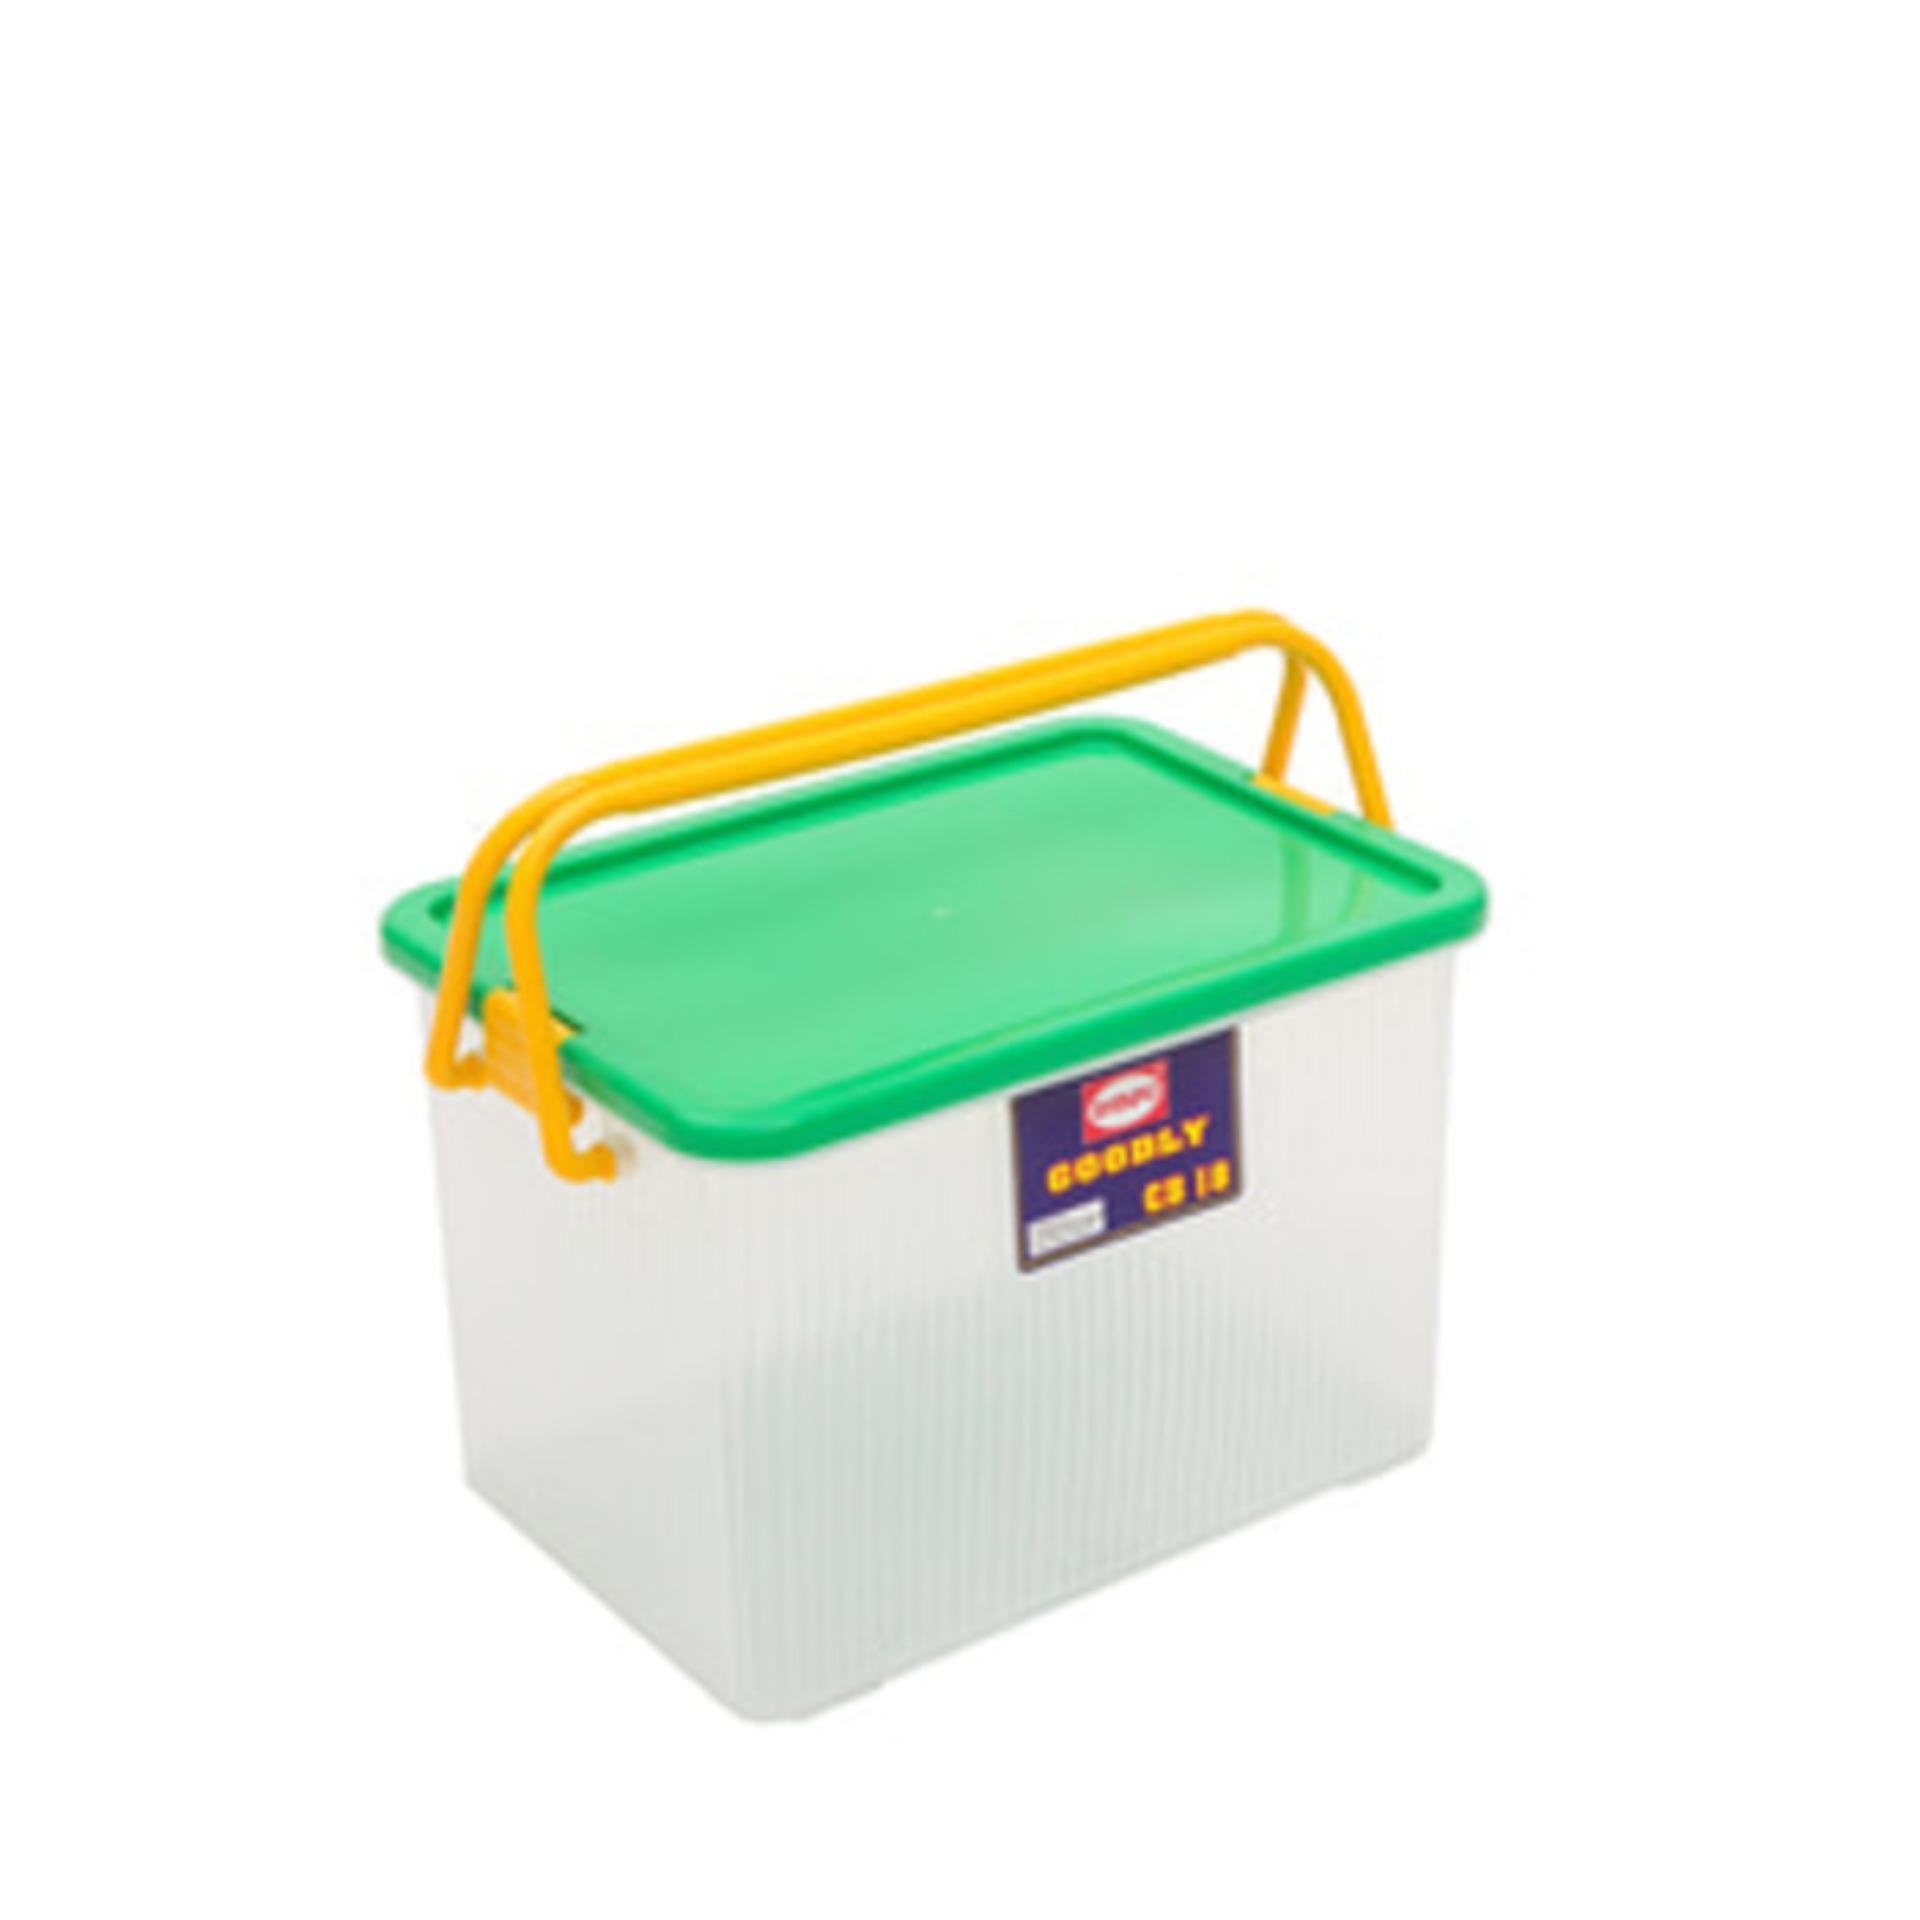 Buy Sell Cheapest Belo Kontainer Dapur Best Quality Product Deals Ikea Pruta Tempat Makanan Isi 17pc Orange Box Plastik Dgn Handle Pegangan 18 Liter